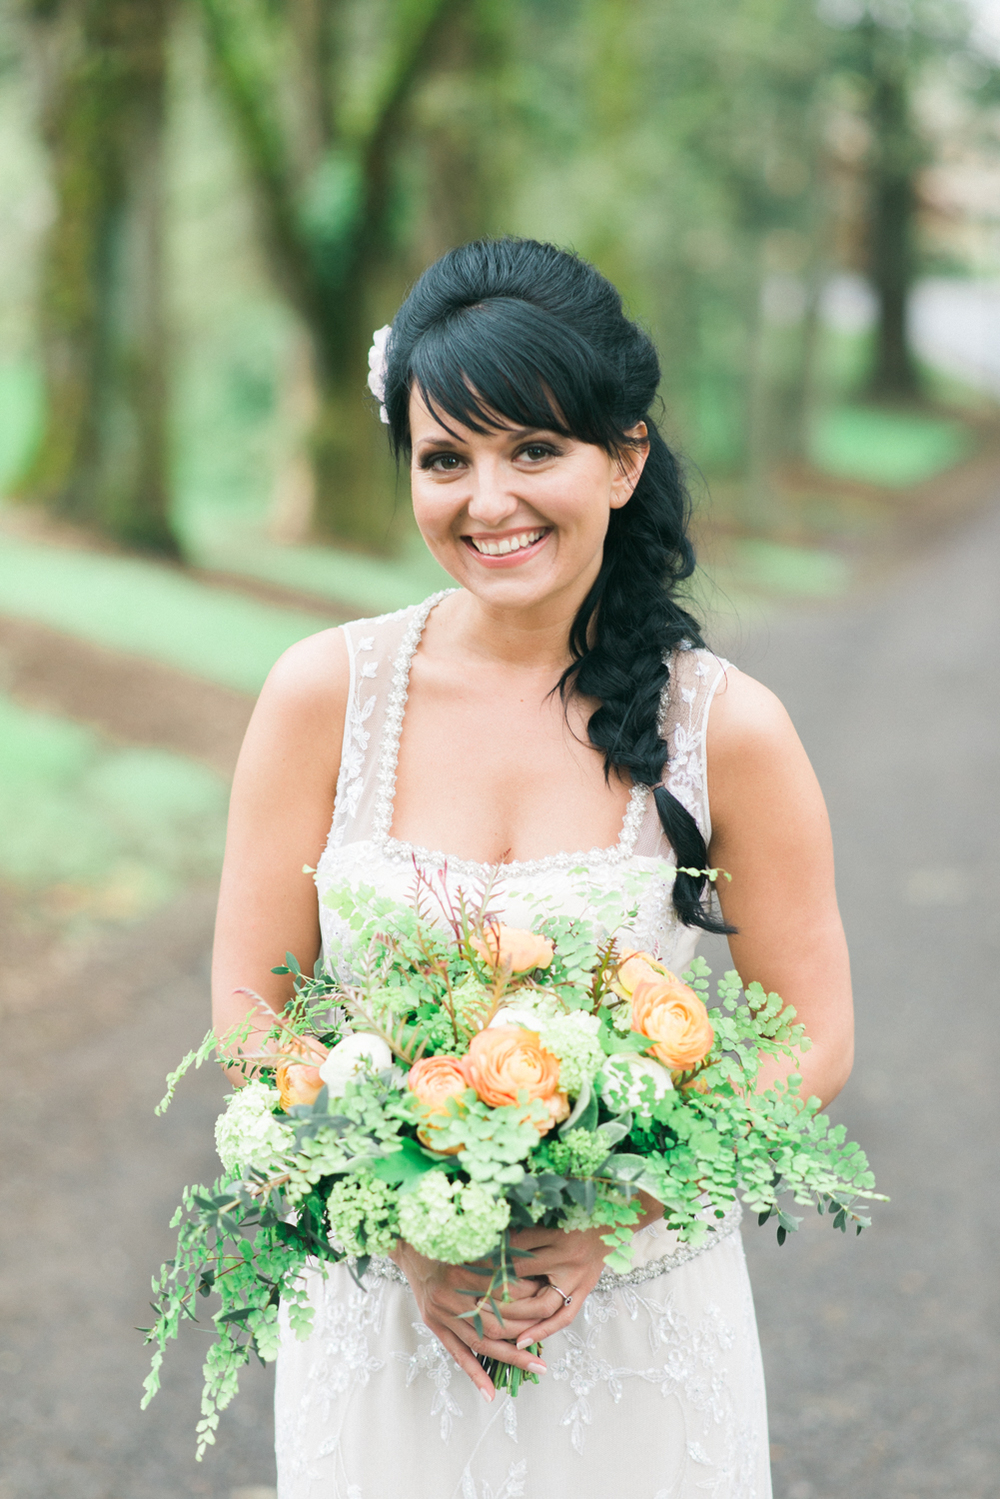 jenkins-estate-bridal-session-portland-oregon-bride-shelley-marie-photo